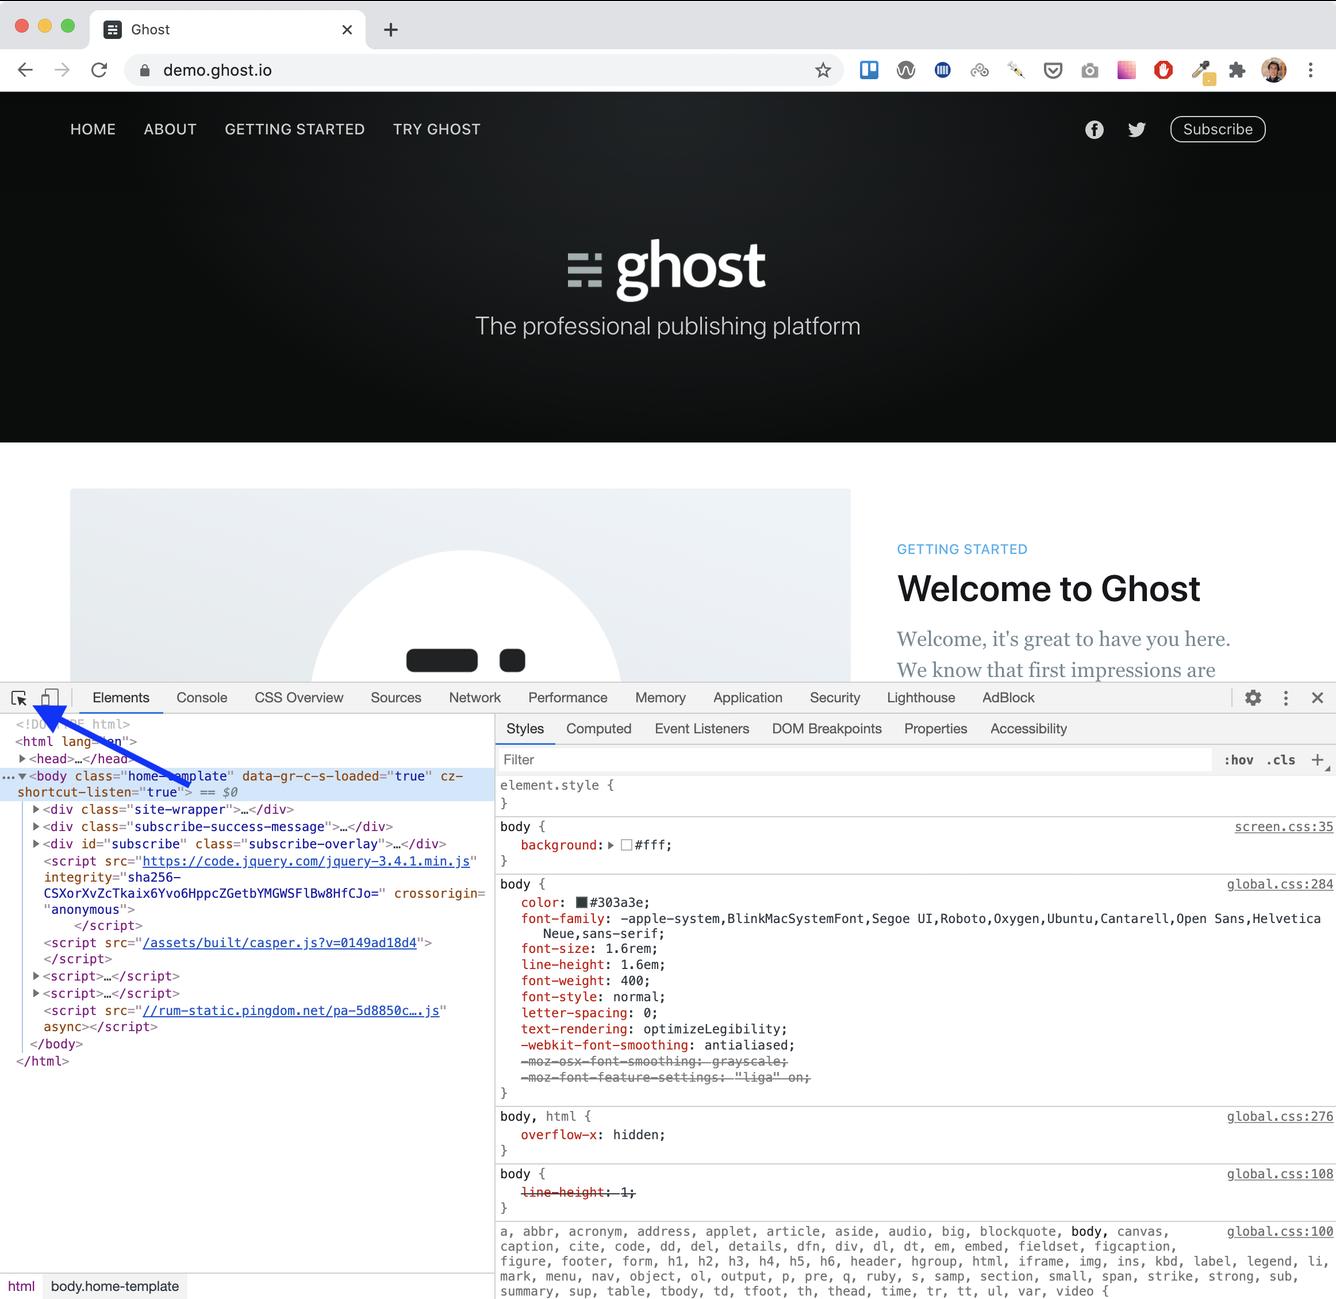 Google Chrome Dev Tools Inspect Icon